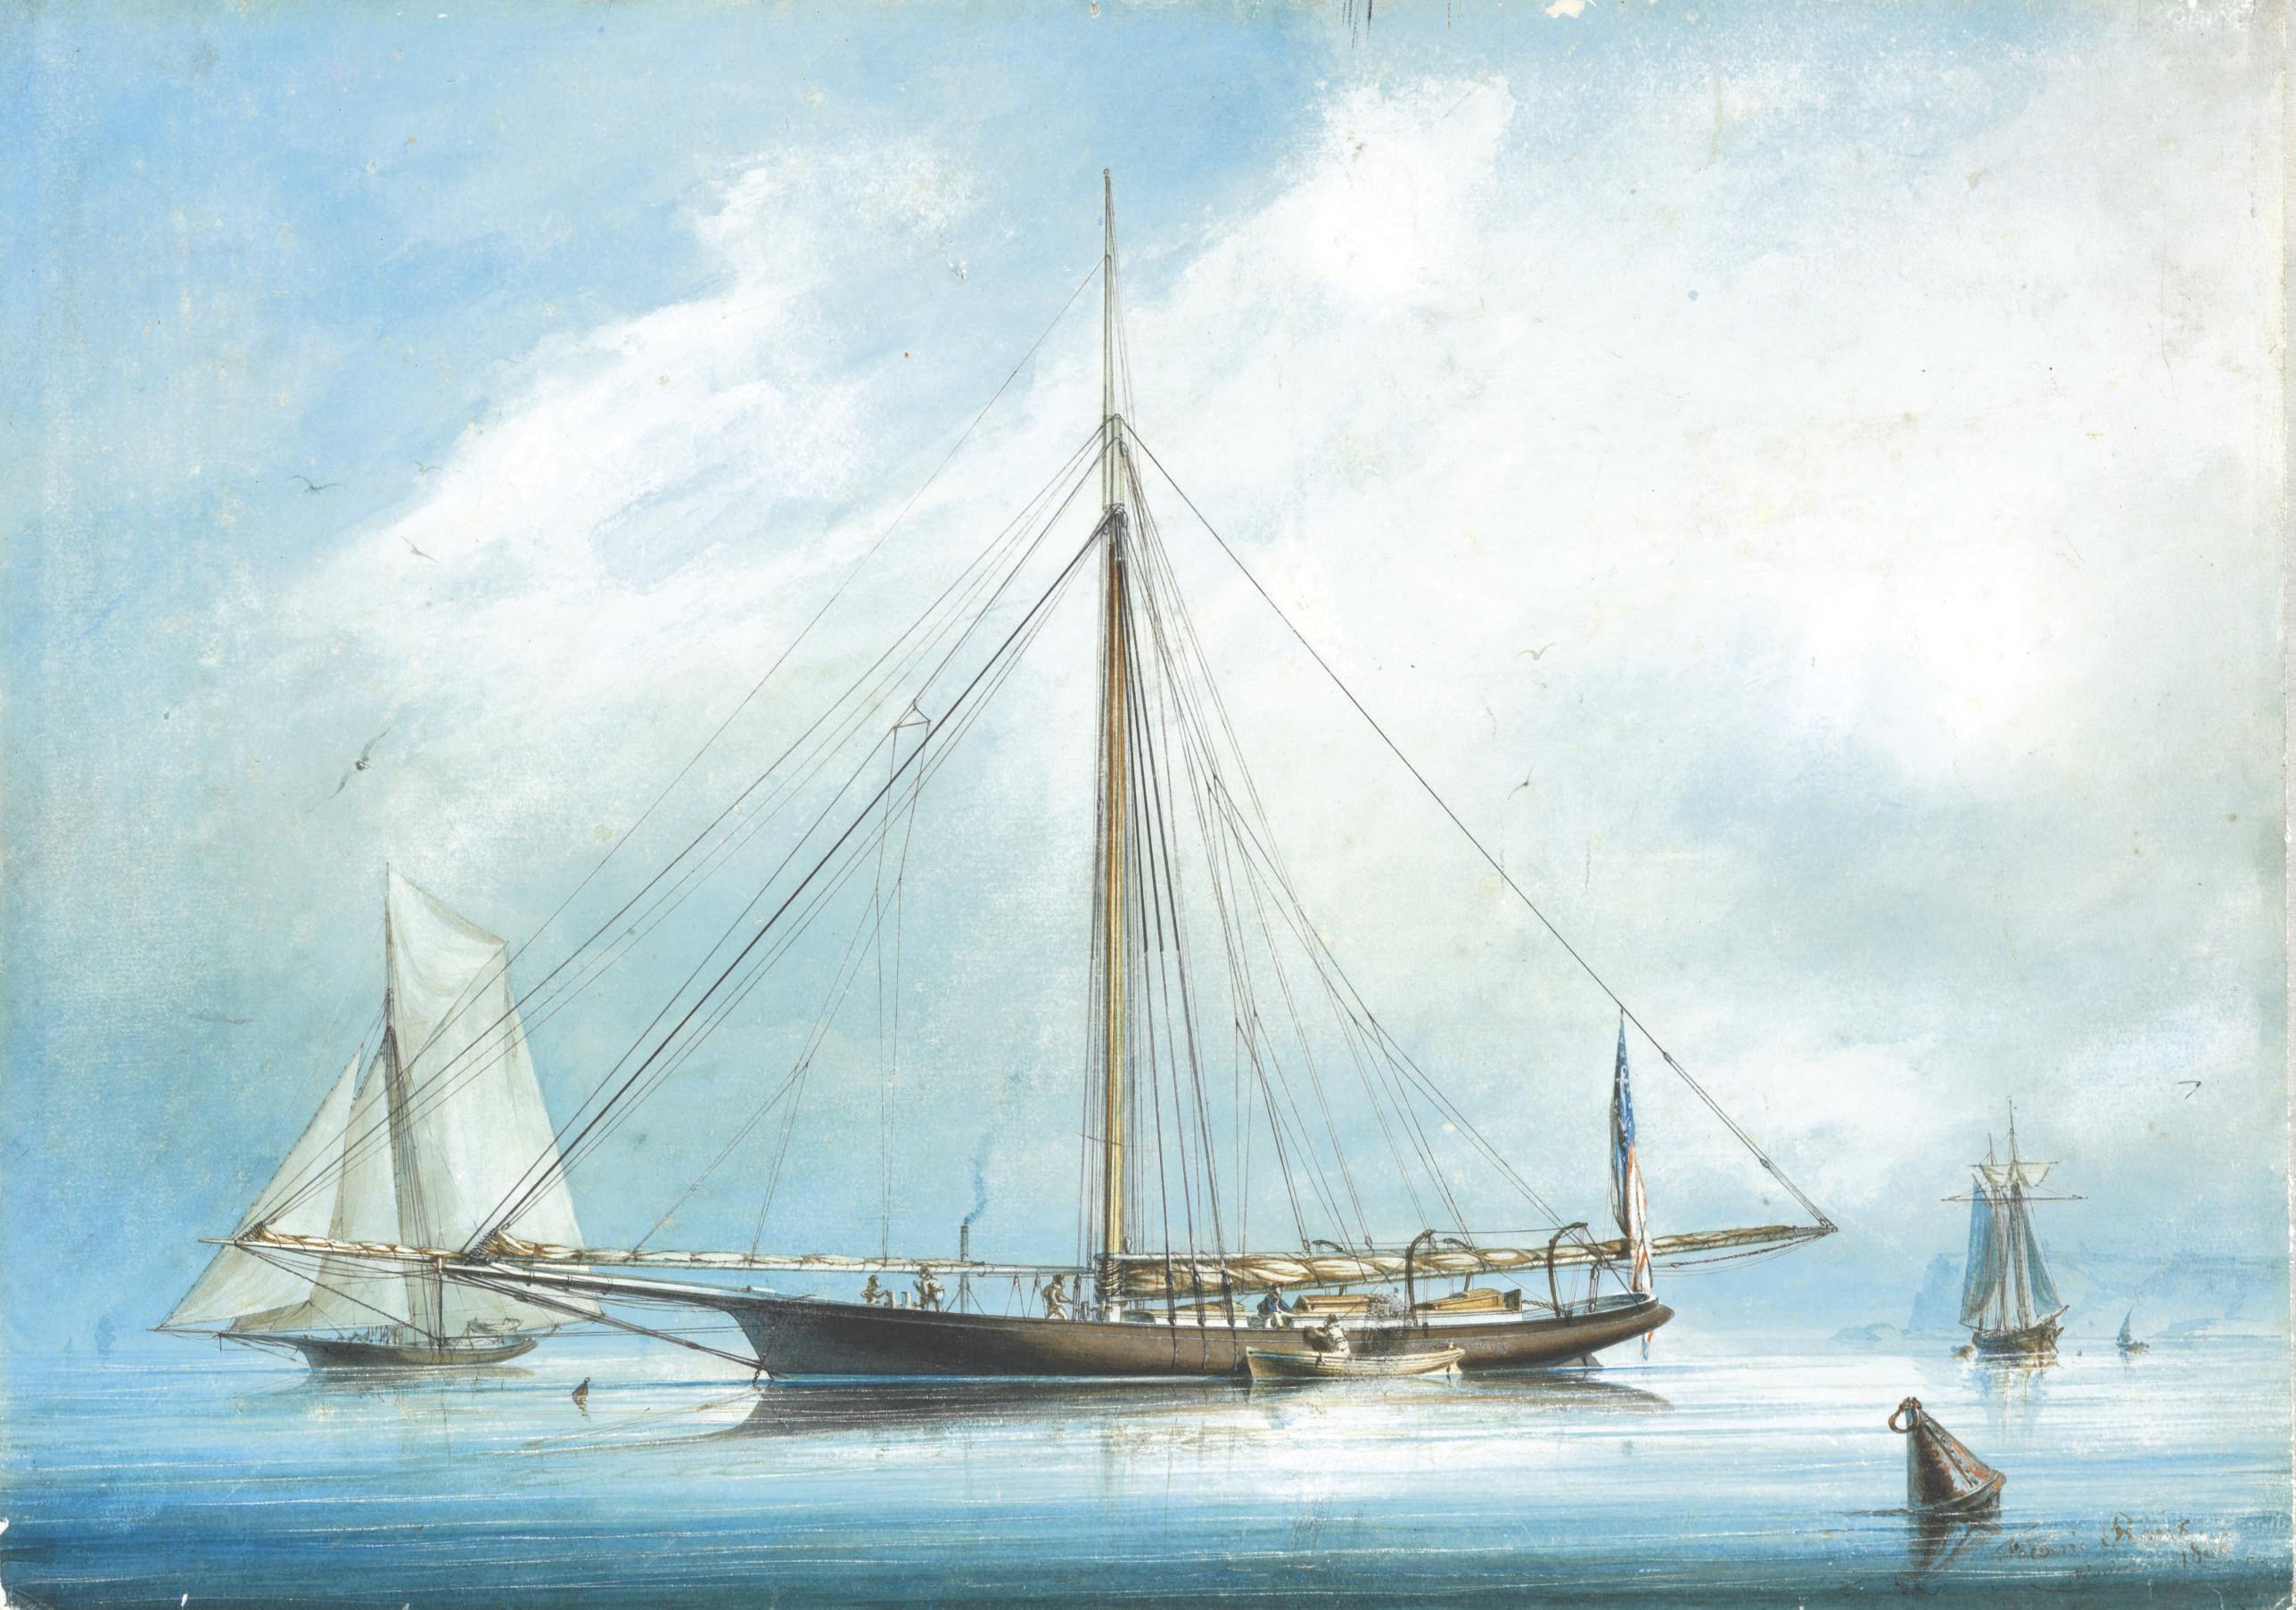 Francois Illas New Tradition: Francois-Joseph-Frederic Roux (French, 1805-1870